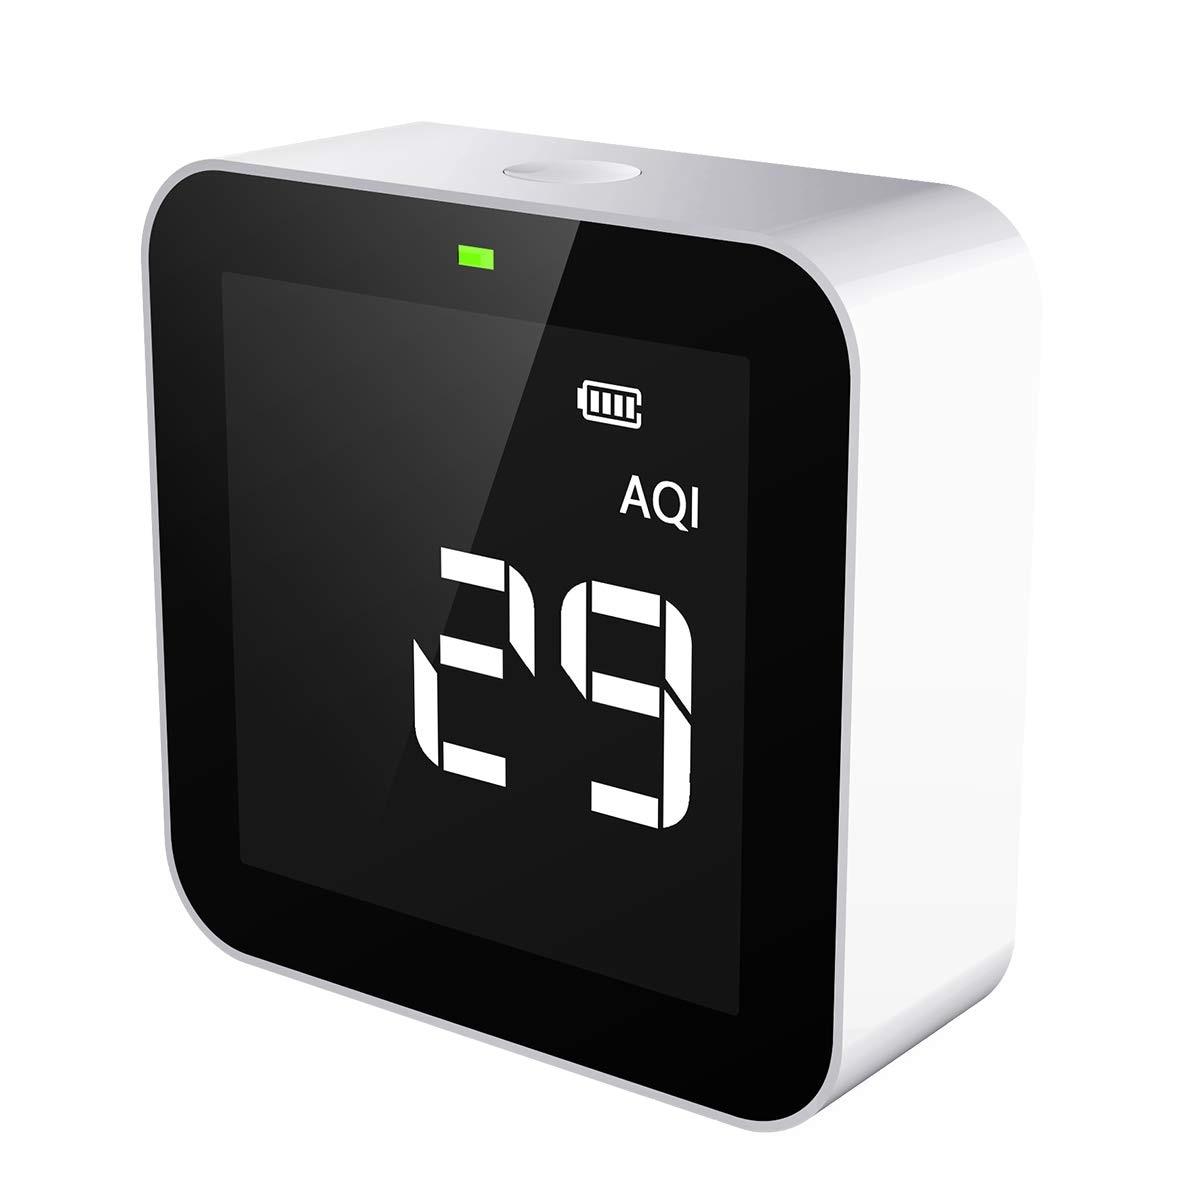 Temtop M10 مراقبة جودة الهواء لعرض PM2.5 HCHO TVOC AQI المهنية مستشعر الكهروكيميائية في الوقت الحقيقي